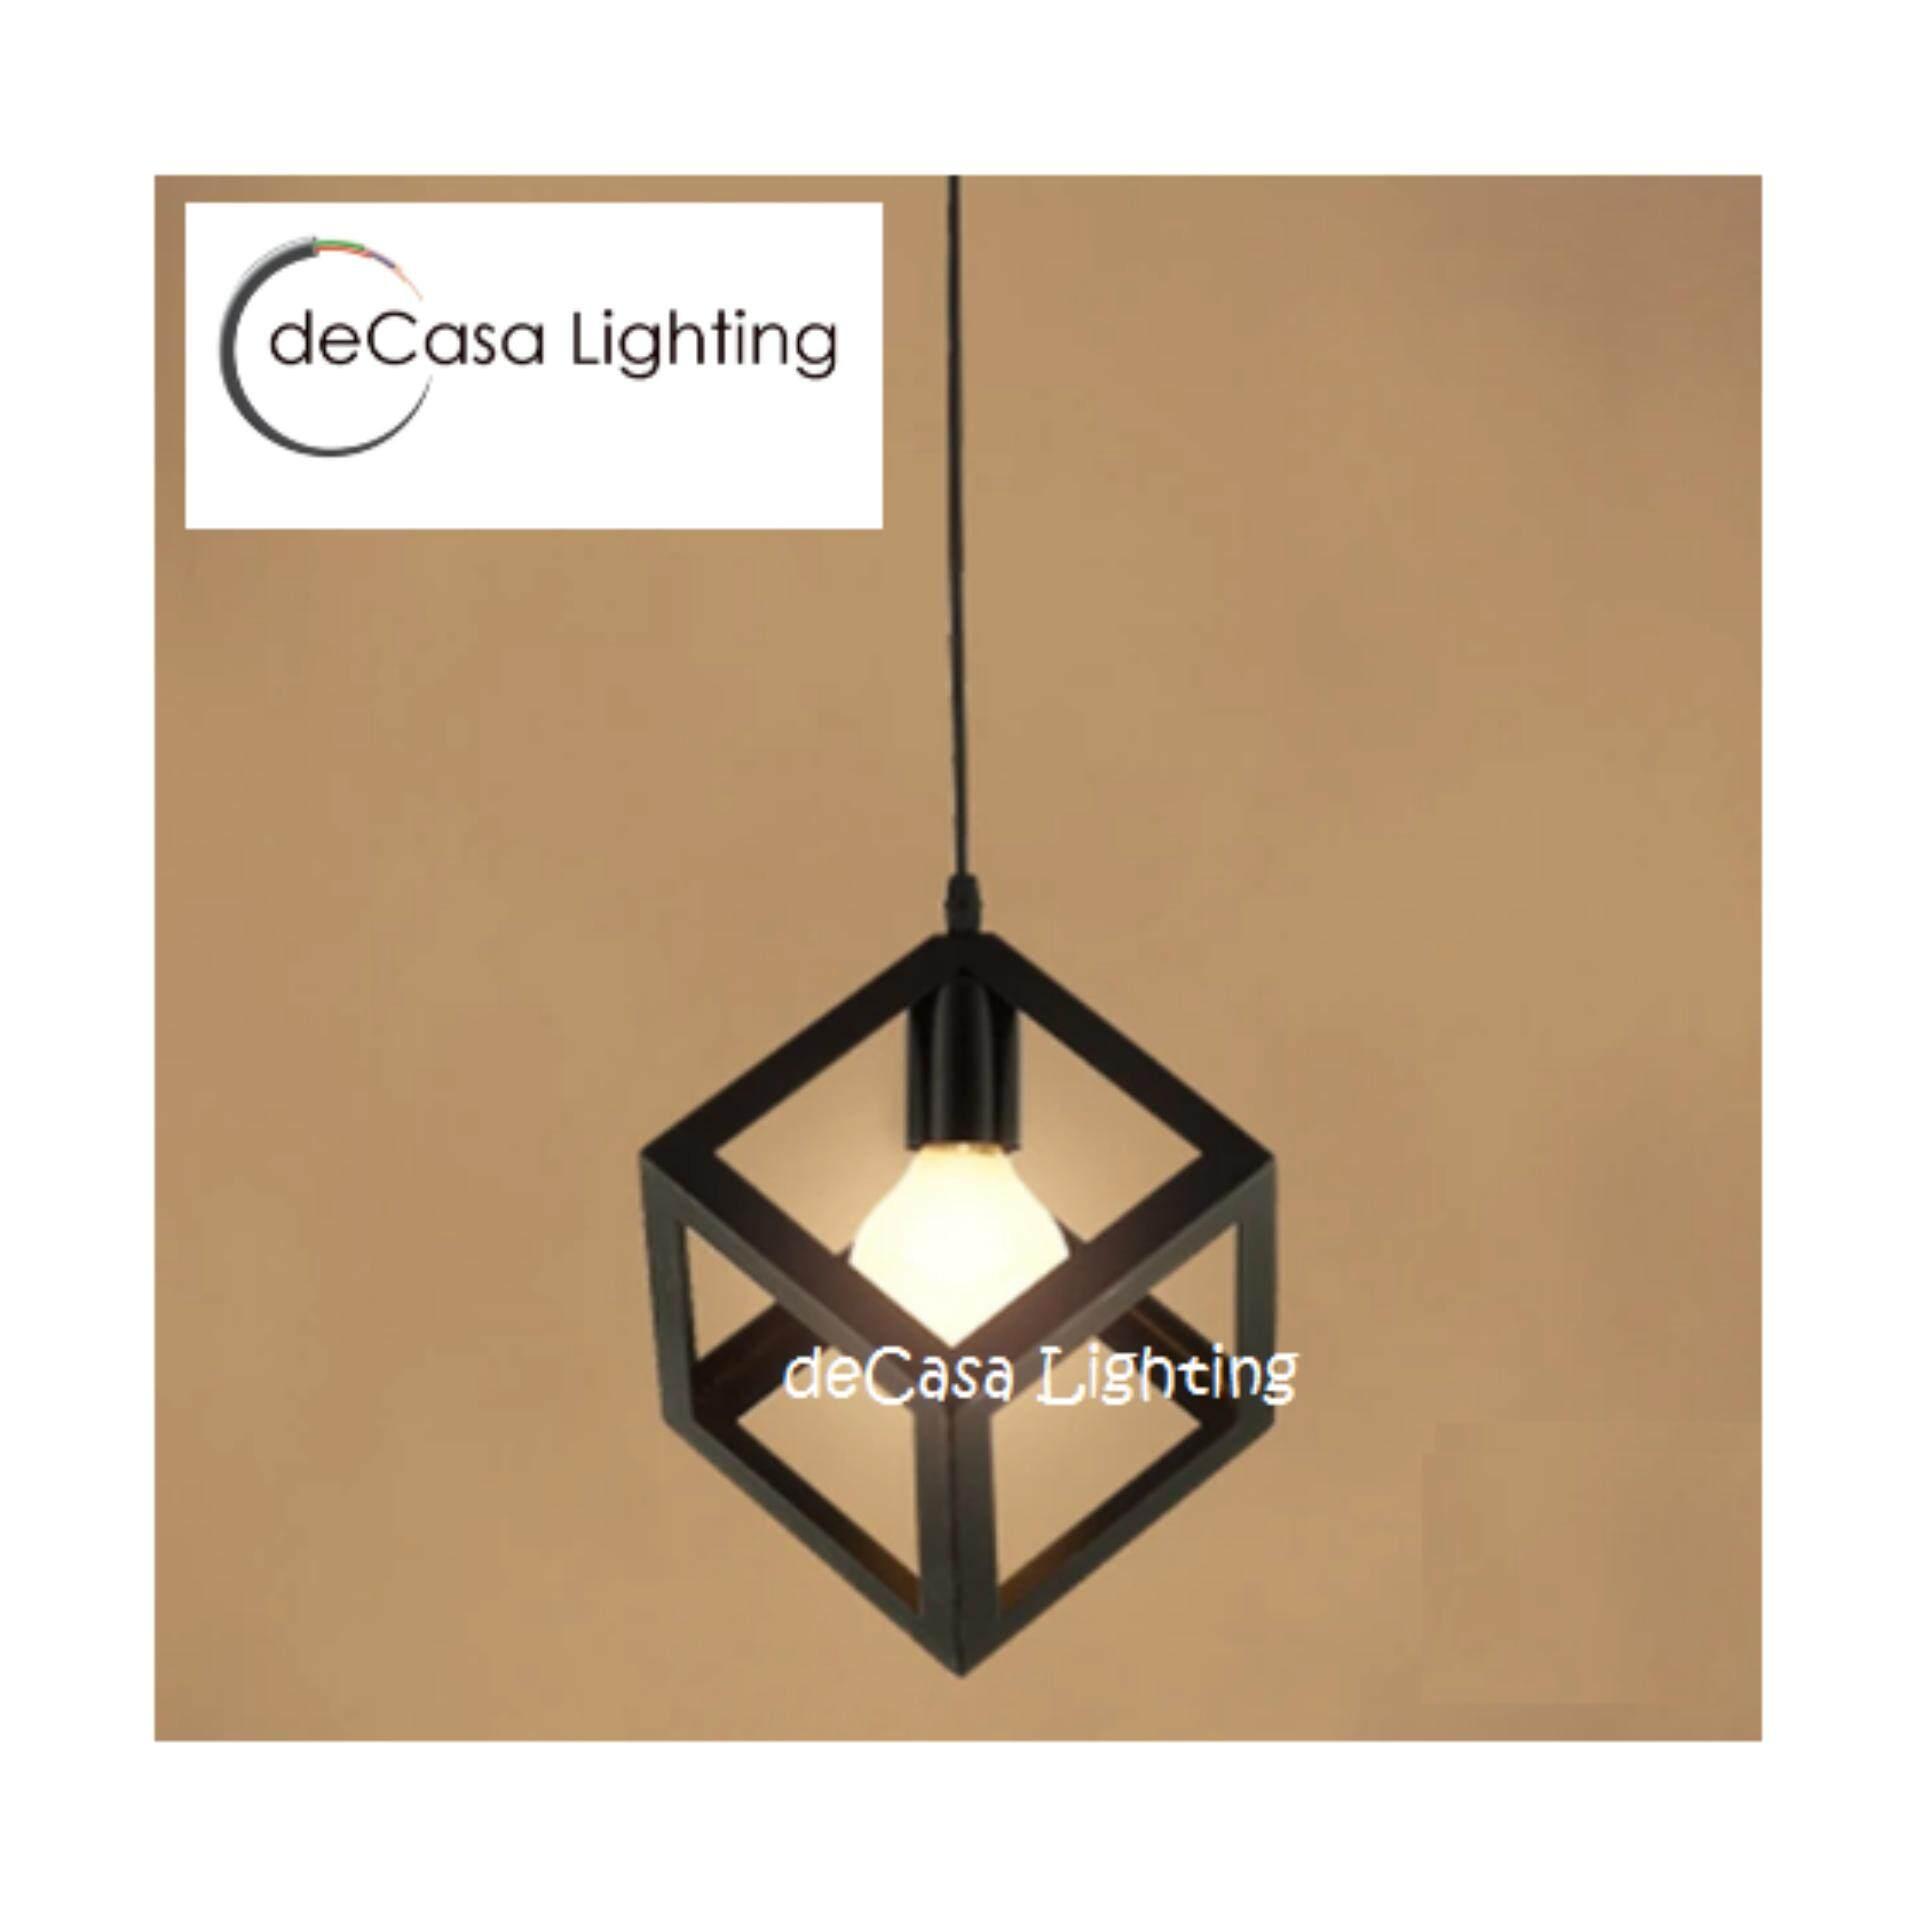 Scandinavian Loft Lamps Lighting home led steel deco dinner lights spot art room deco kitchen id design - Cube Black  (JL-PX807)